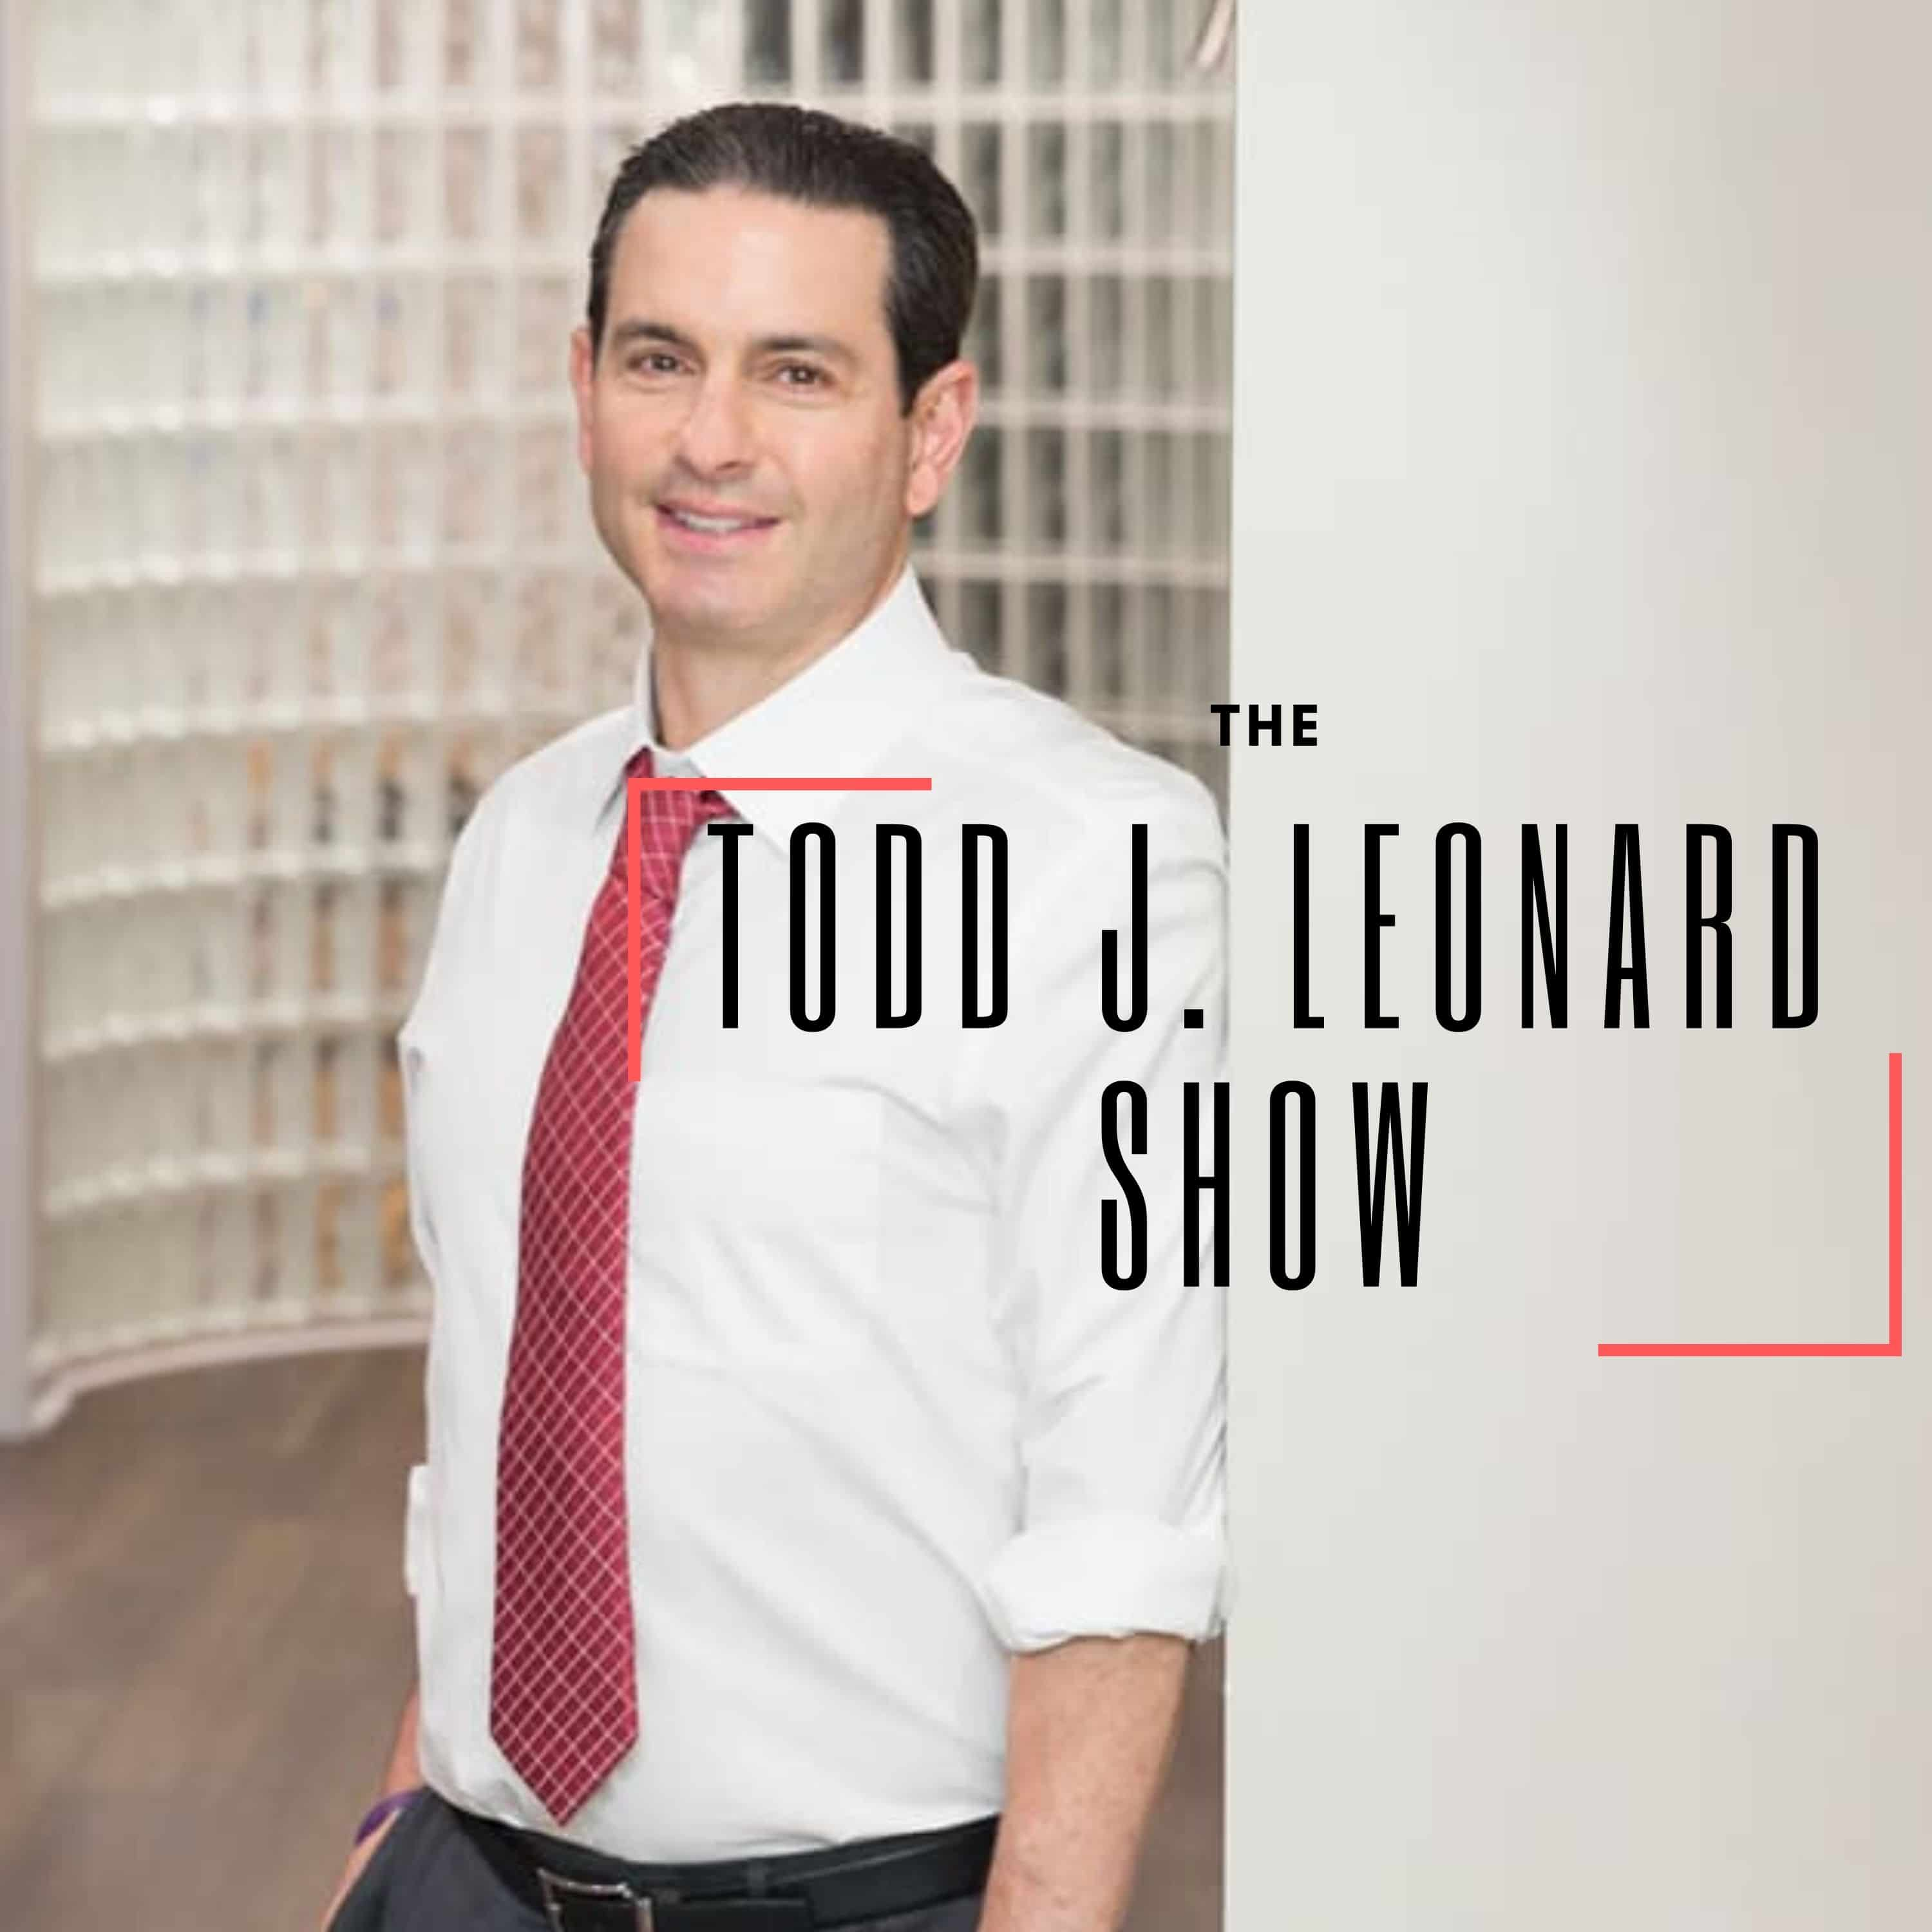 The Todd Leonard Show